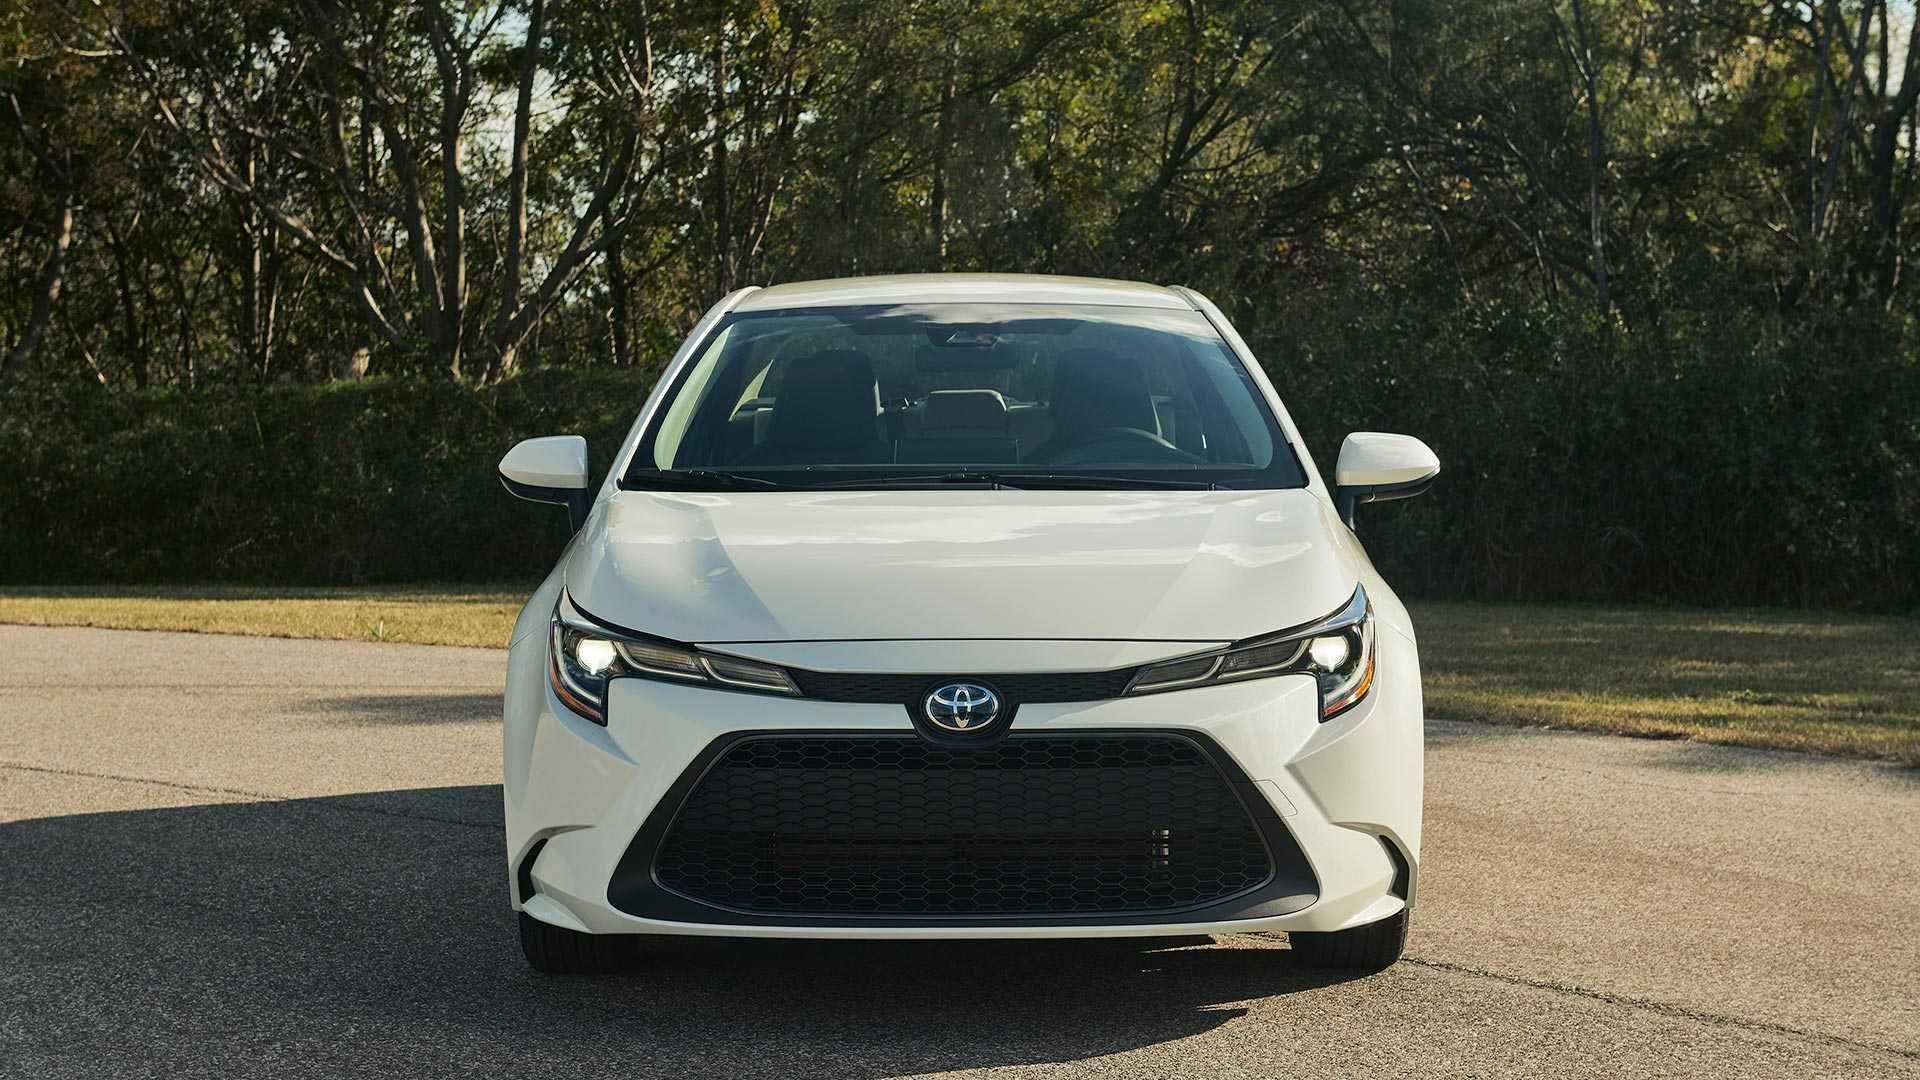 Pin On Hybrid Cars